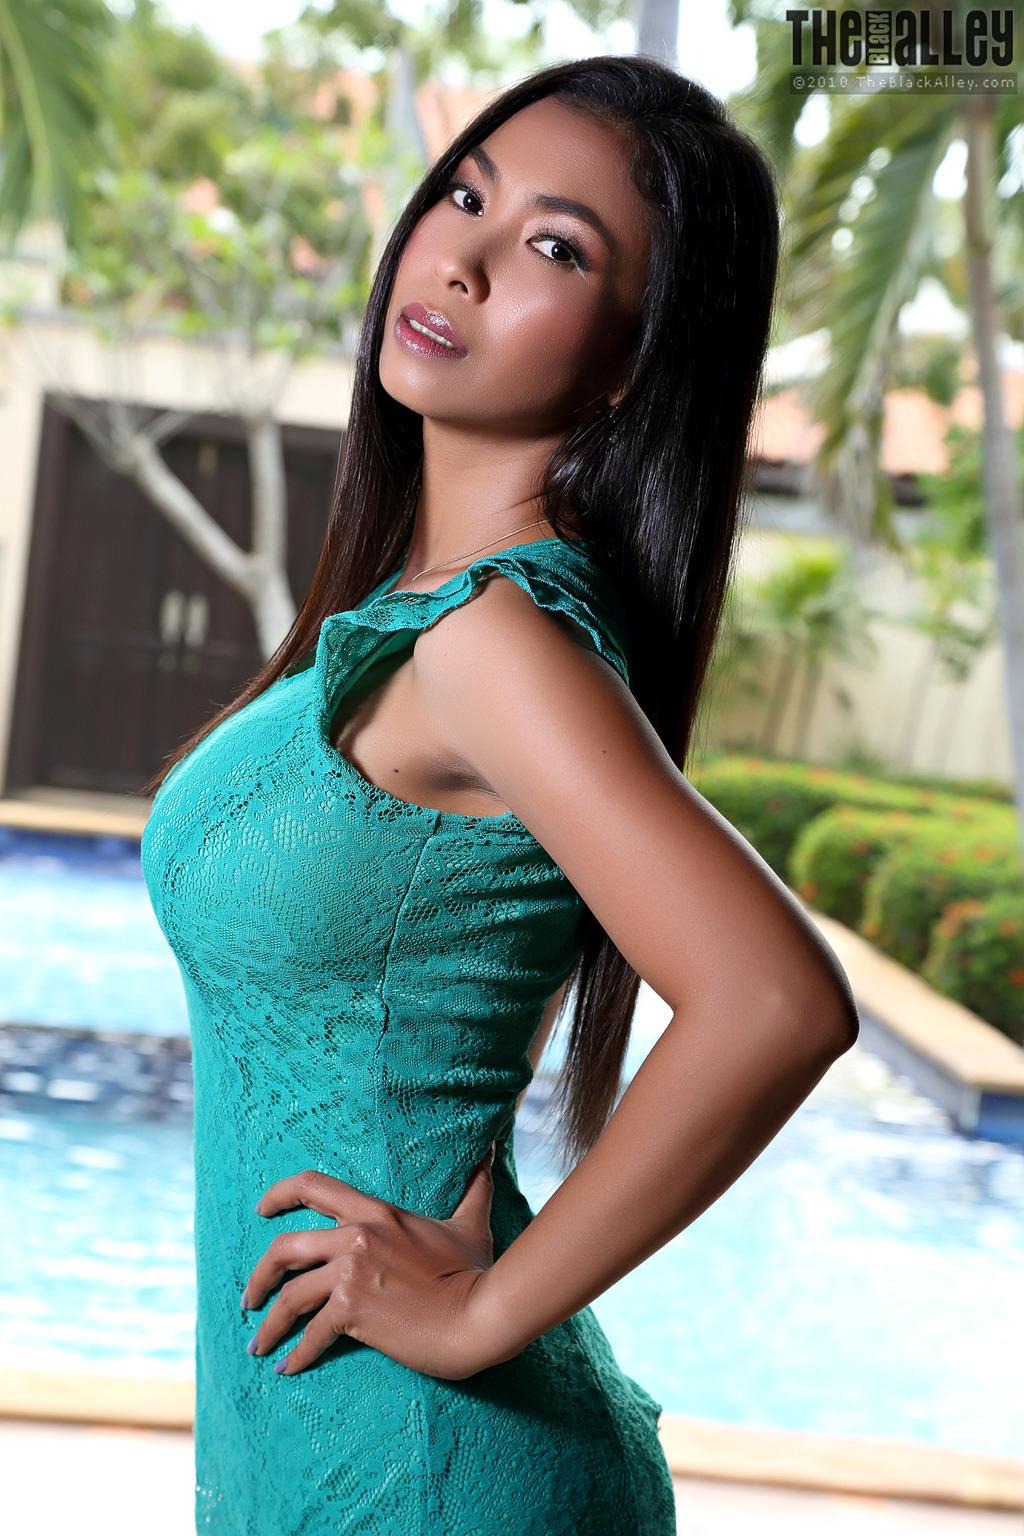 PHOTO | Calisia 00 - Busty Asian Babe Calisia